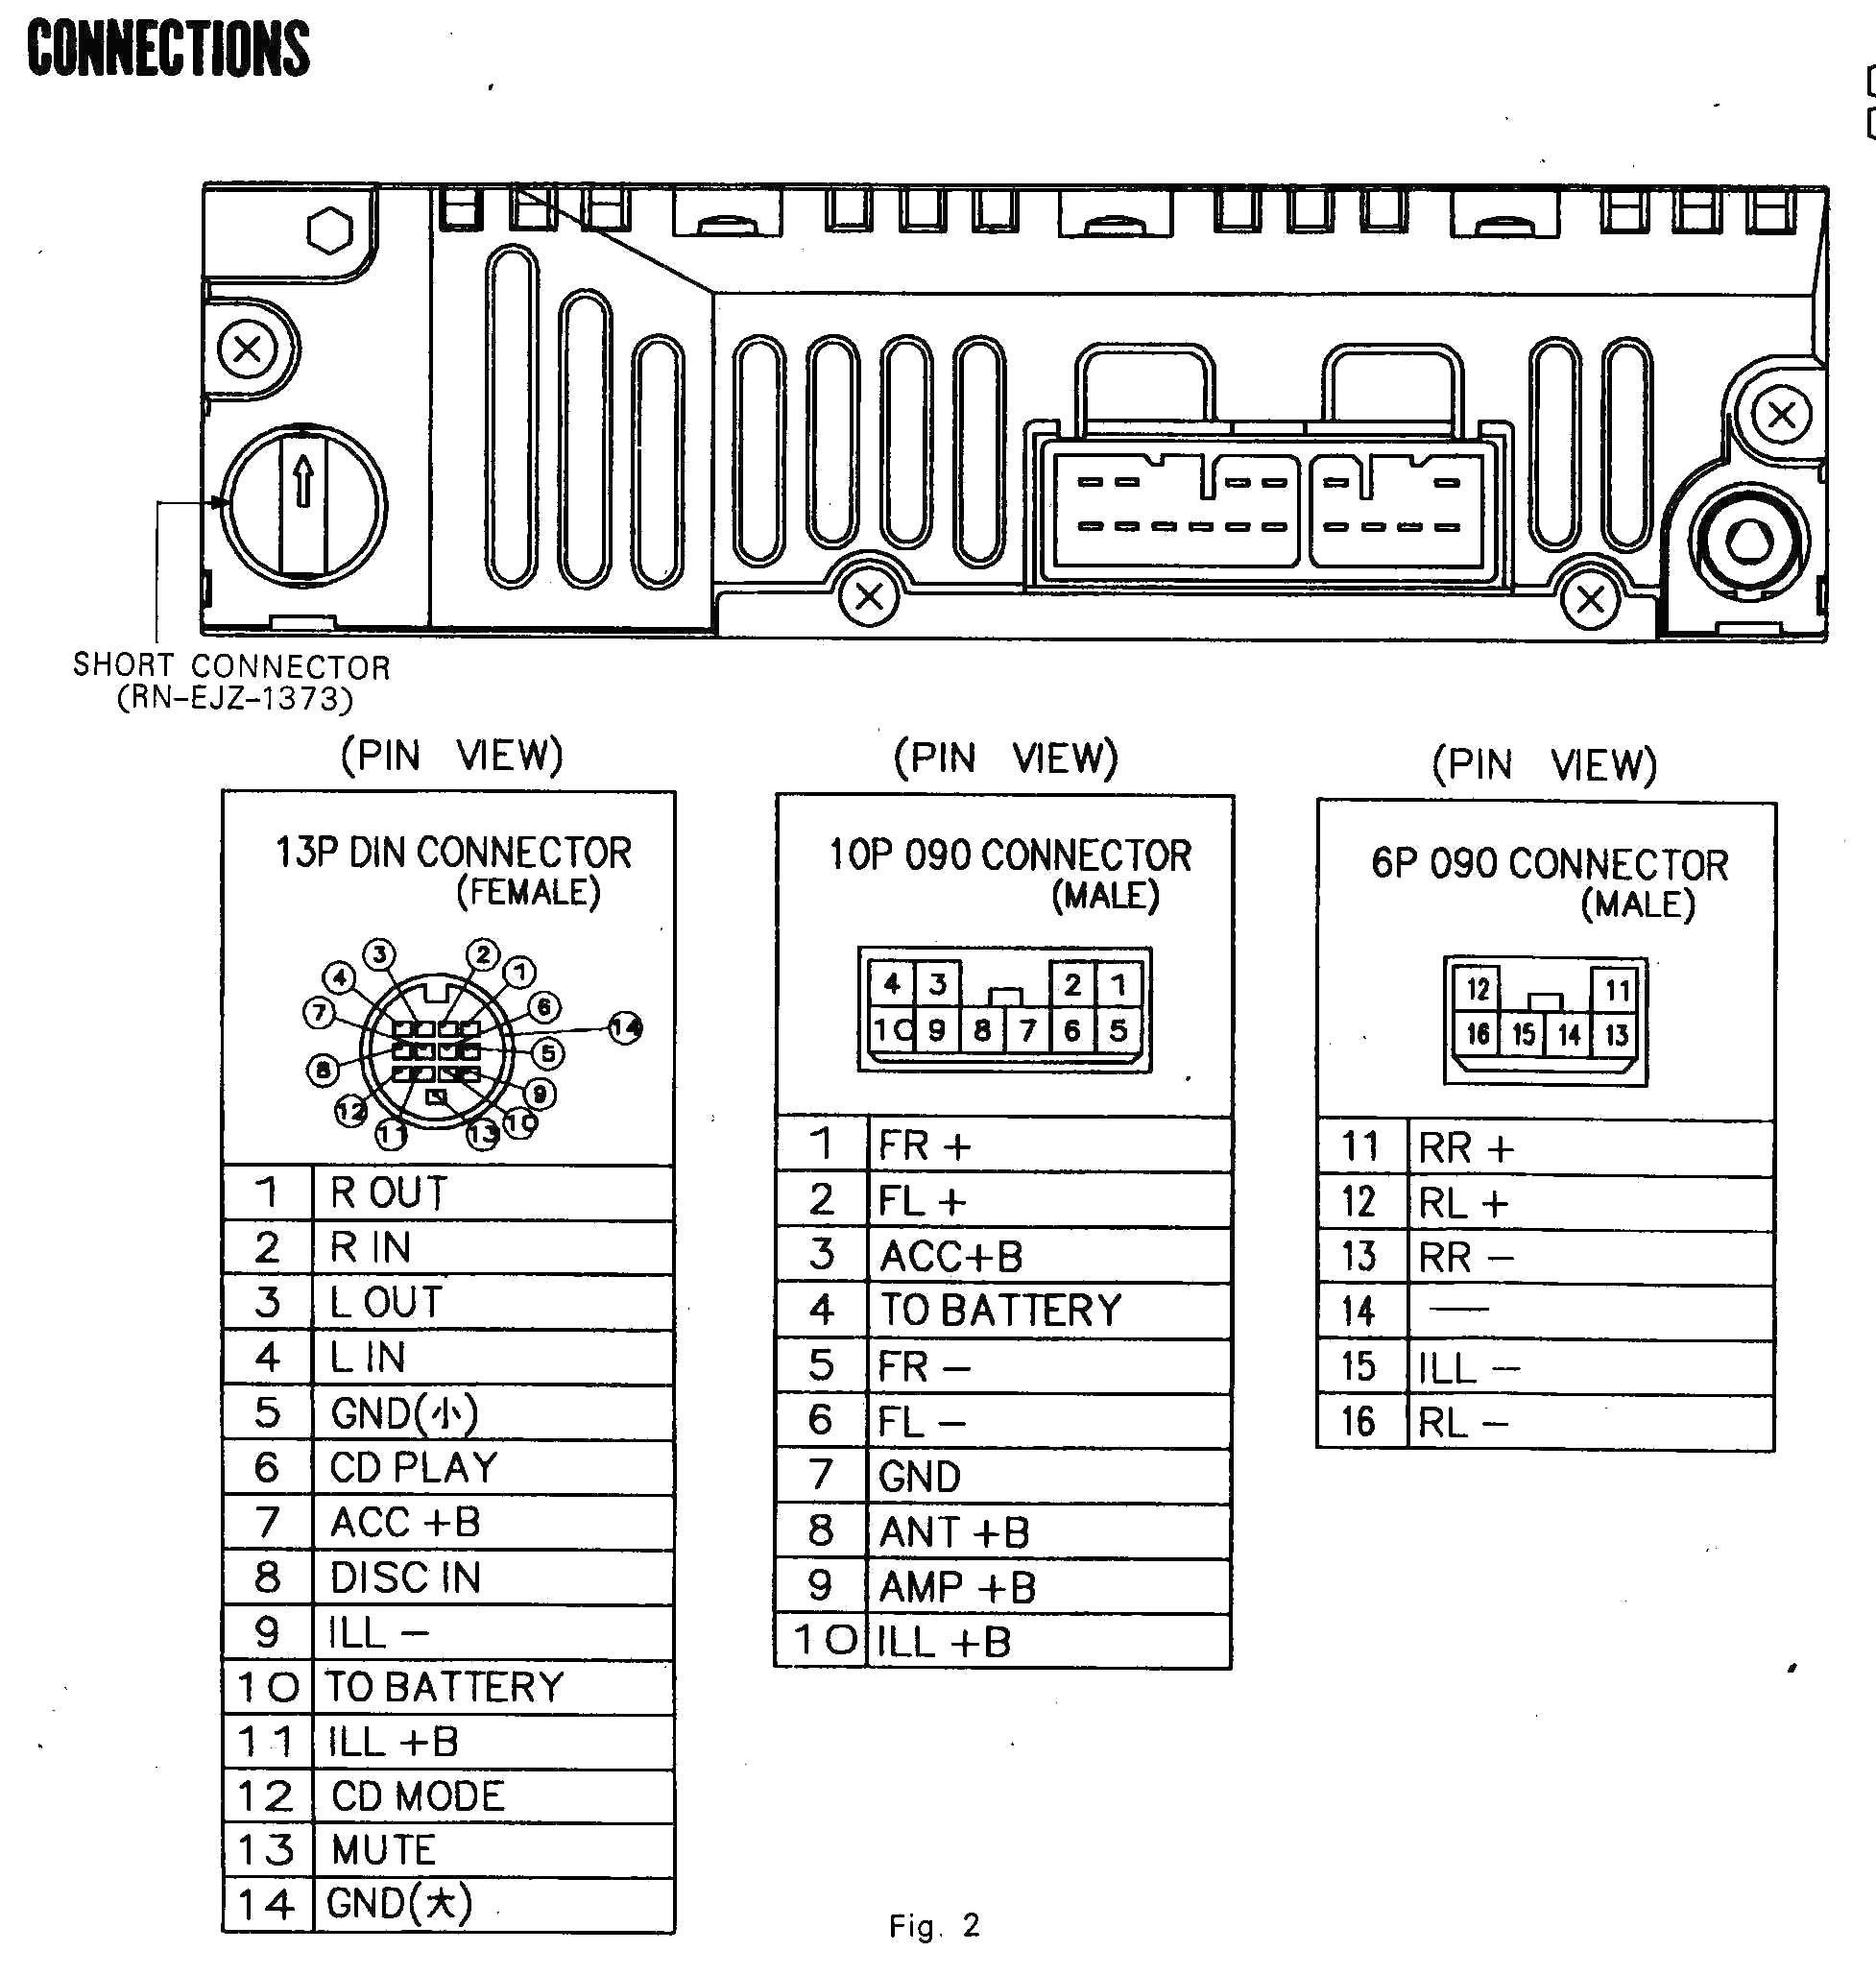 Panasonic Car Stereo Wiring Diagram from detoxicrecenze.com